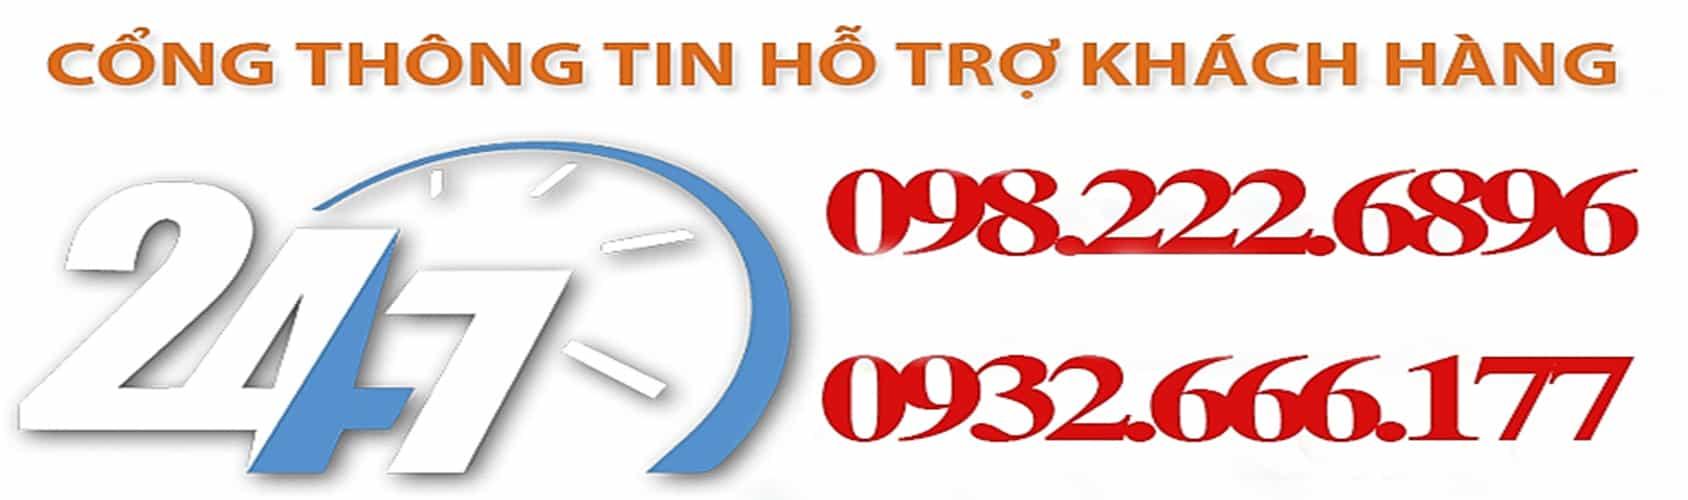 cong-thong-tin-can-dien-tu-hiep-phat